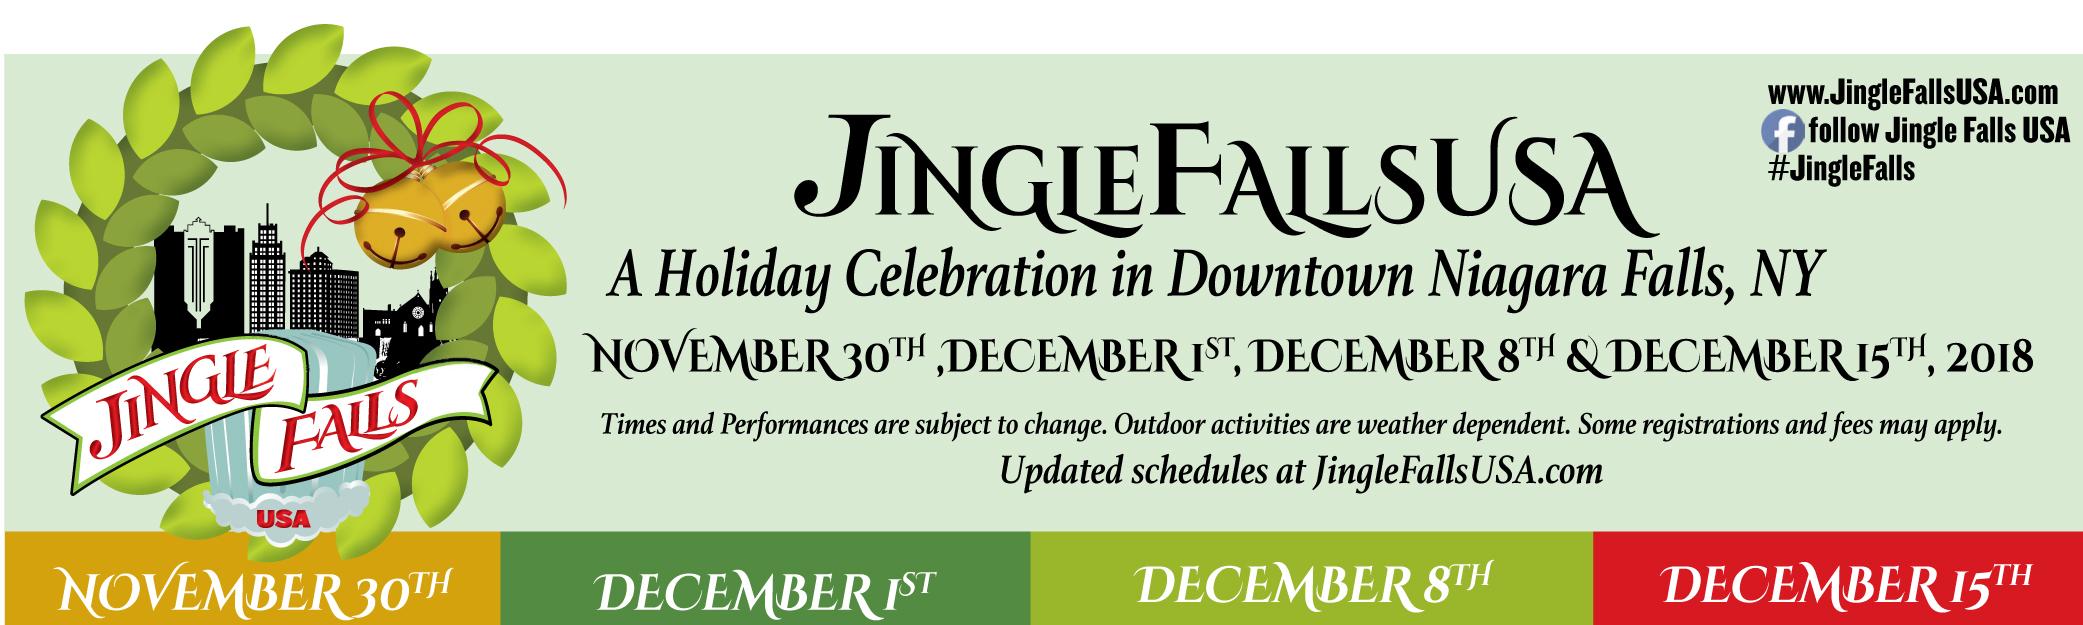 Jingle Falls 2018 Banner